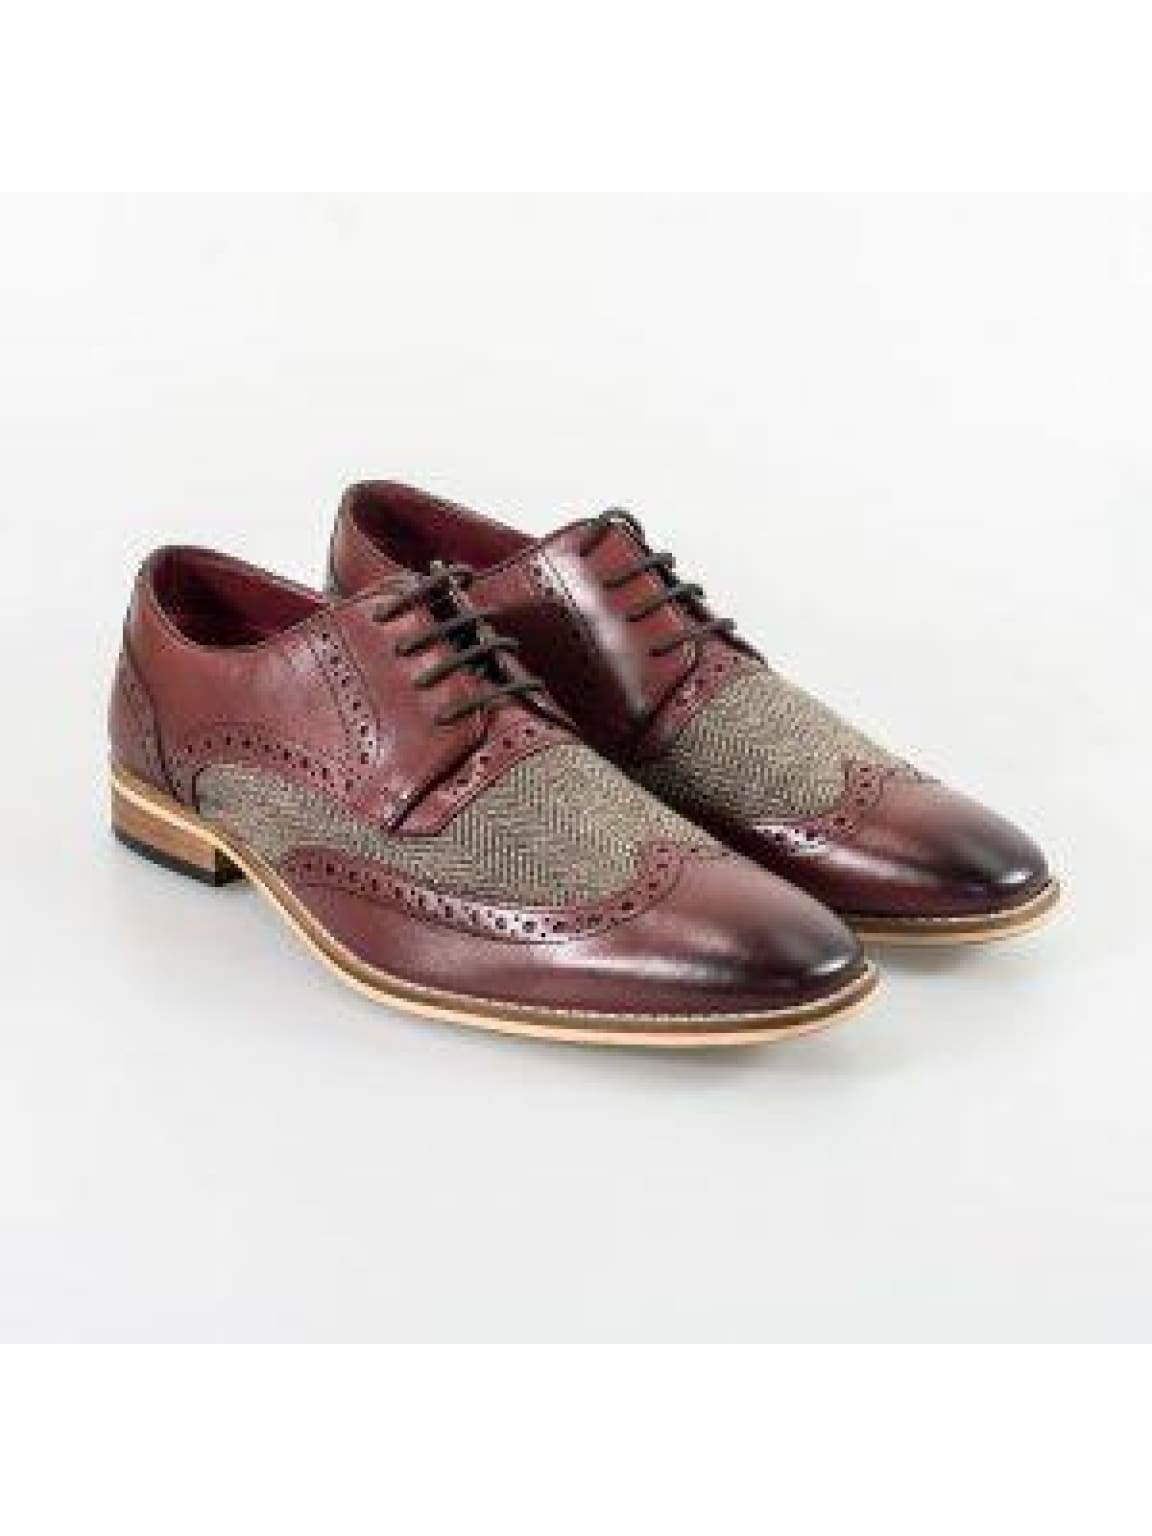 Cavani William Bordo Mens Shoes - UK7 | EU41 - Shoes